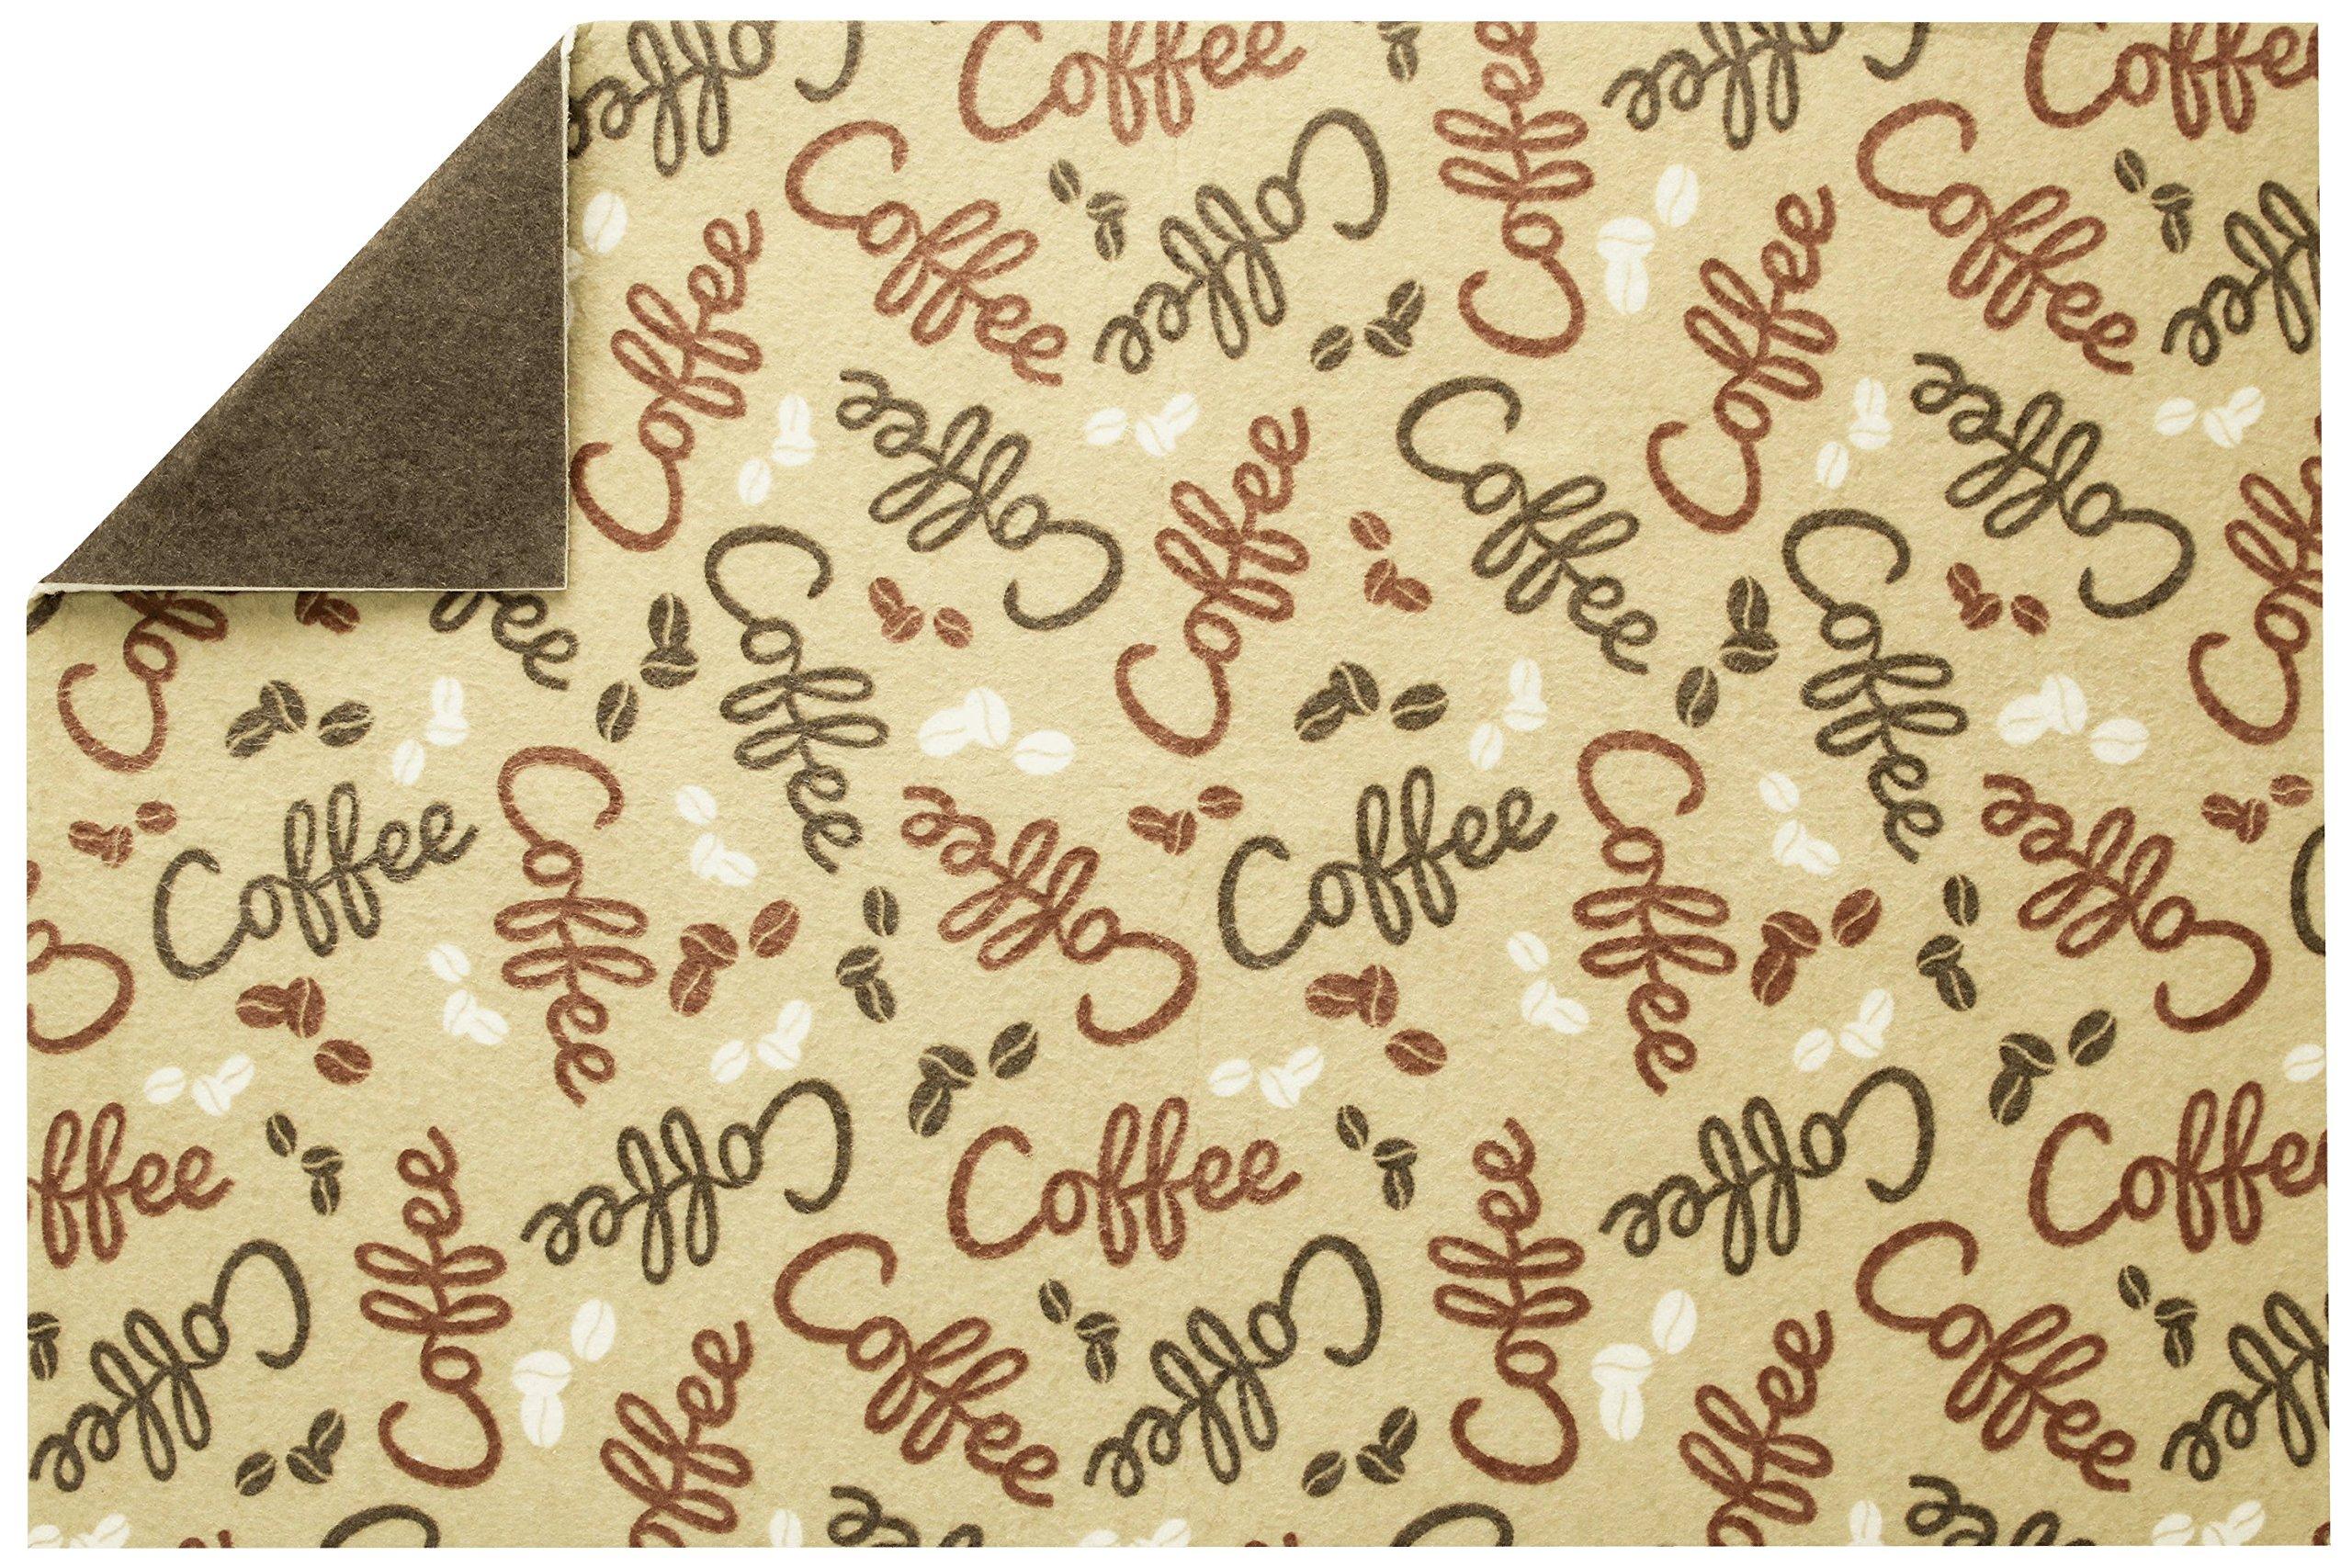 S&T 591601 Coffee and Java Maker Mat, 12'' x 18'', Coffee Print